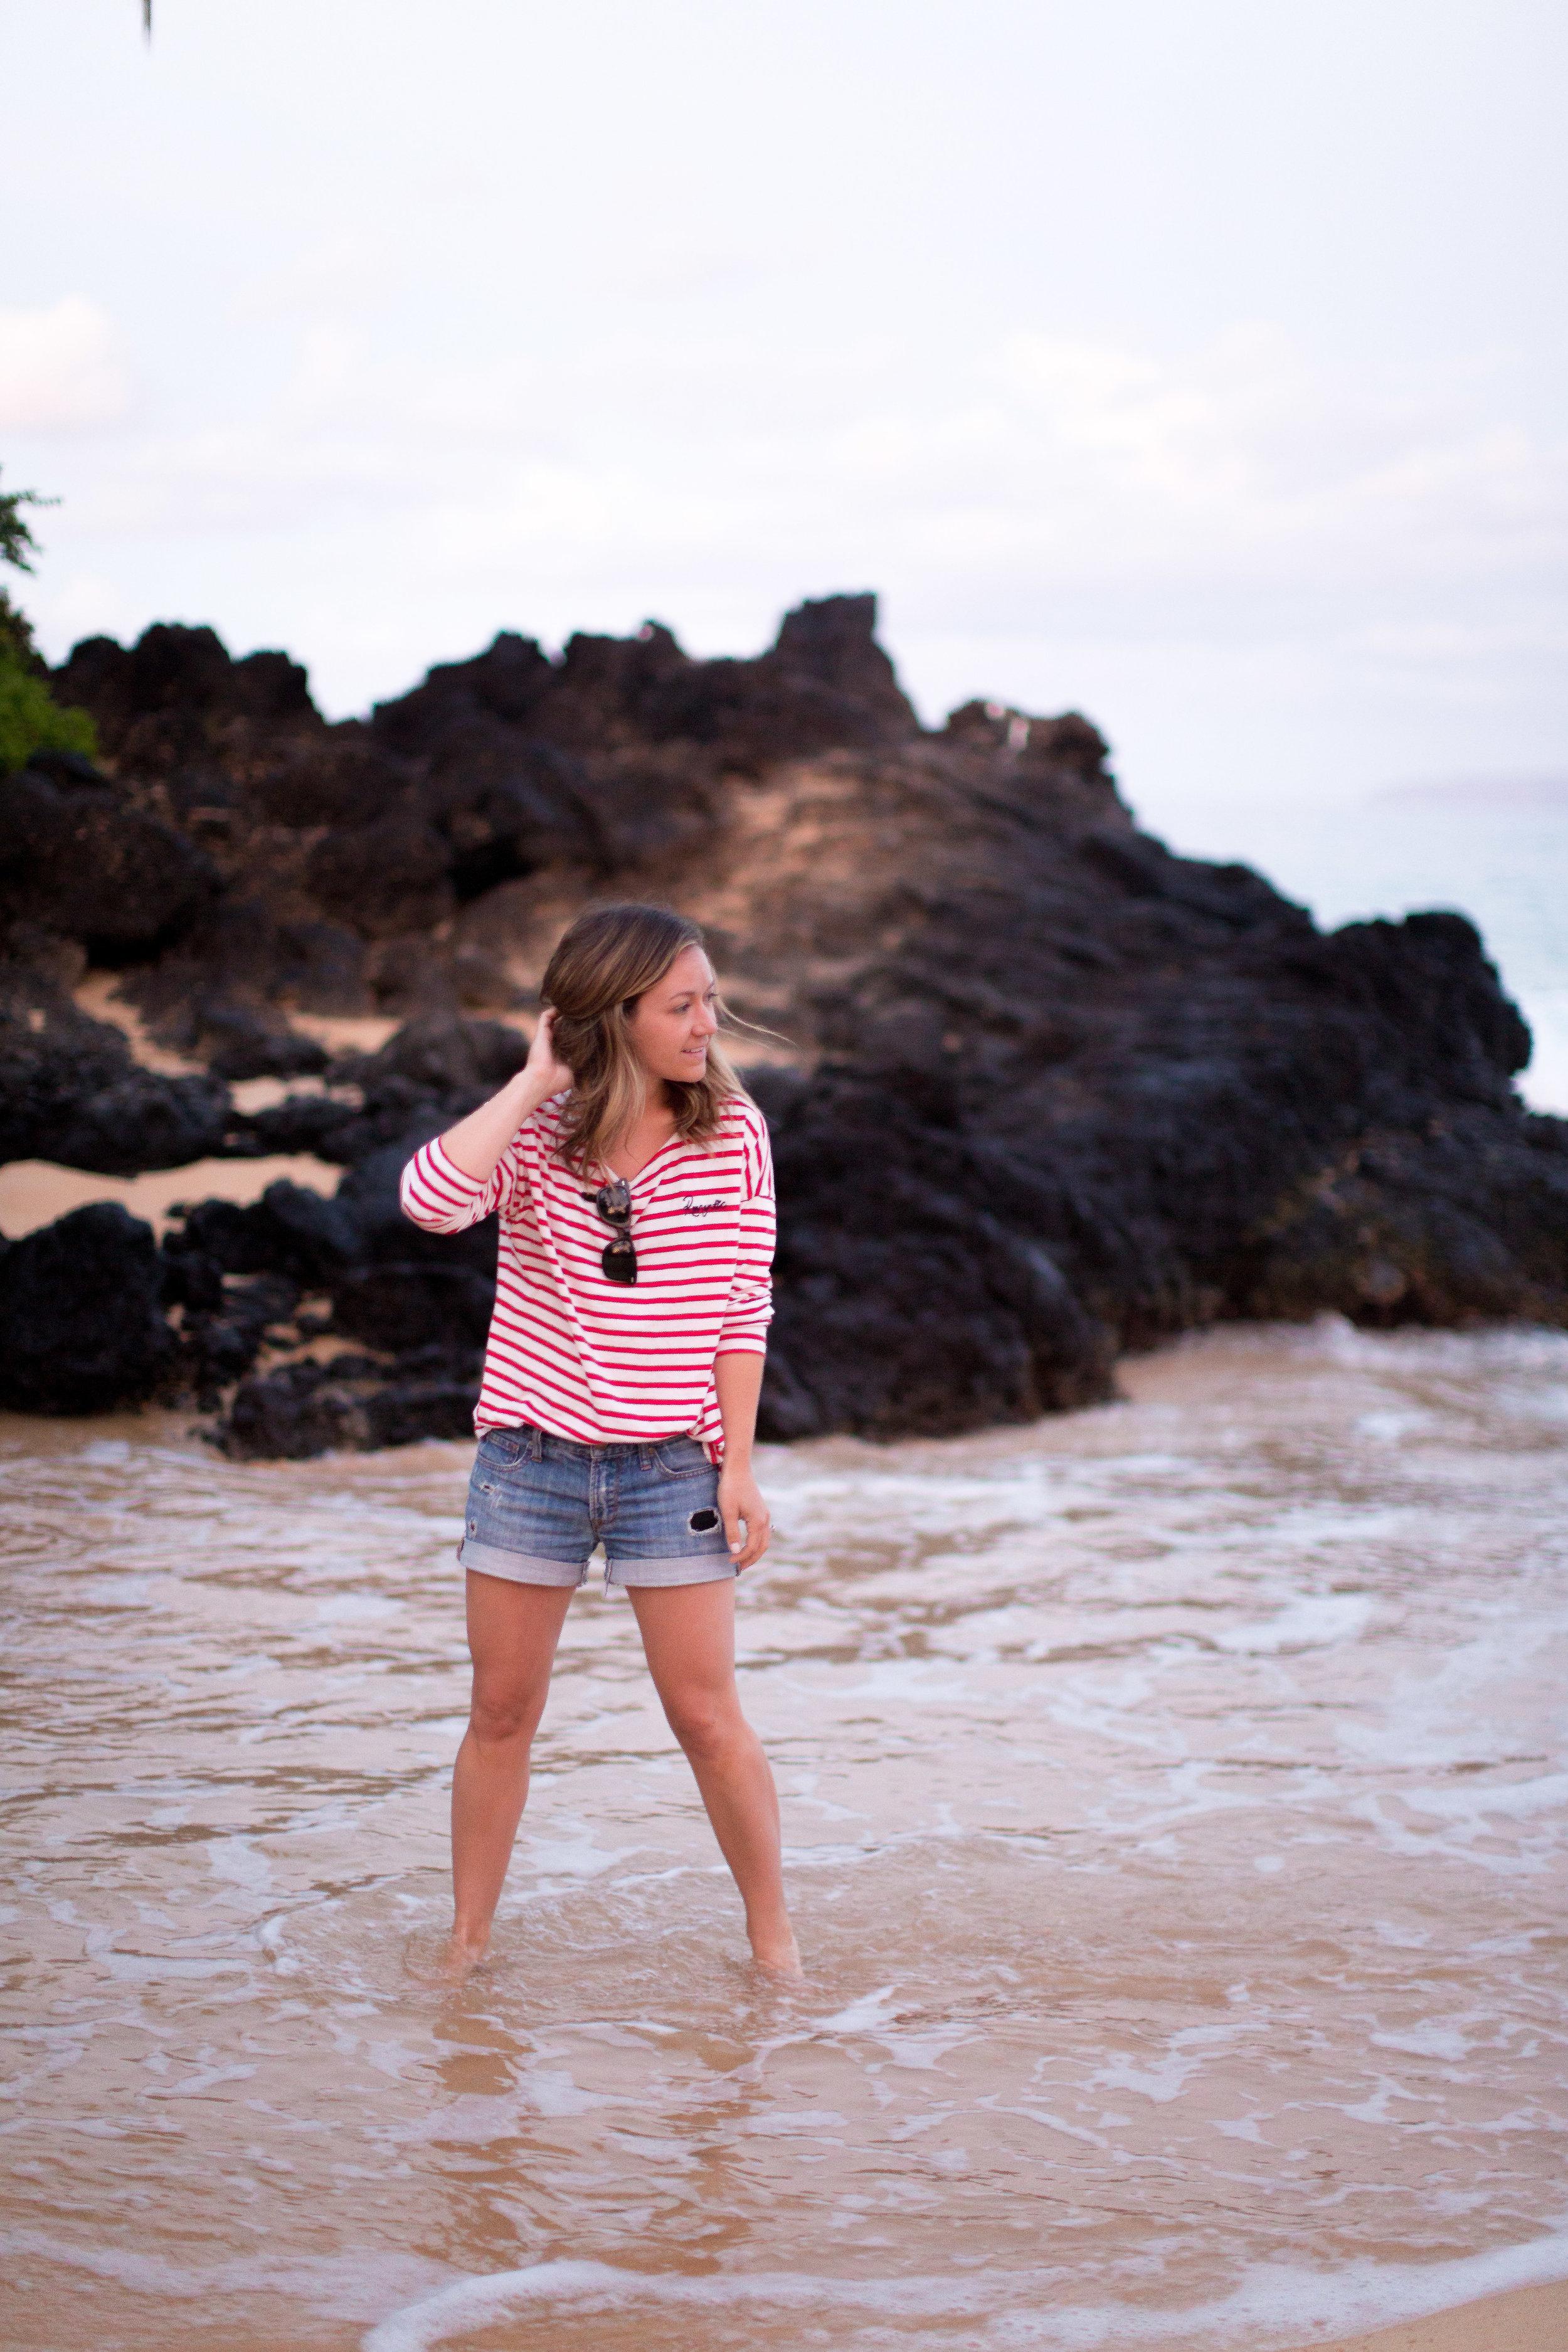 fizz-fade-hawaii-sunrise-stripes2-27.jpg